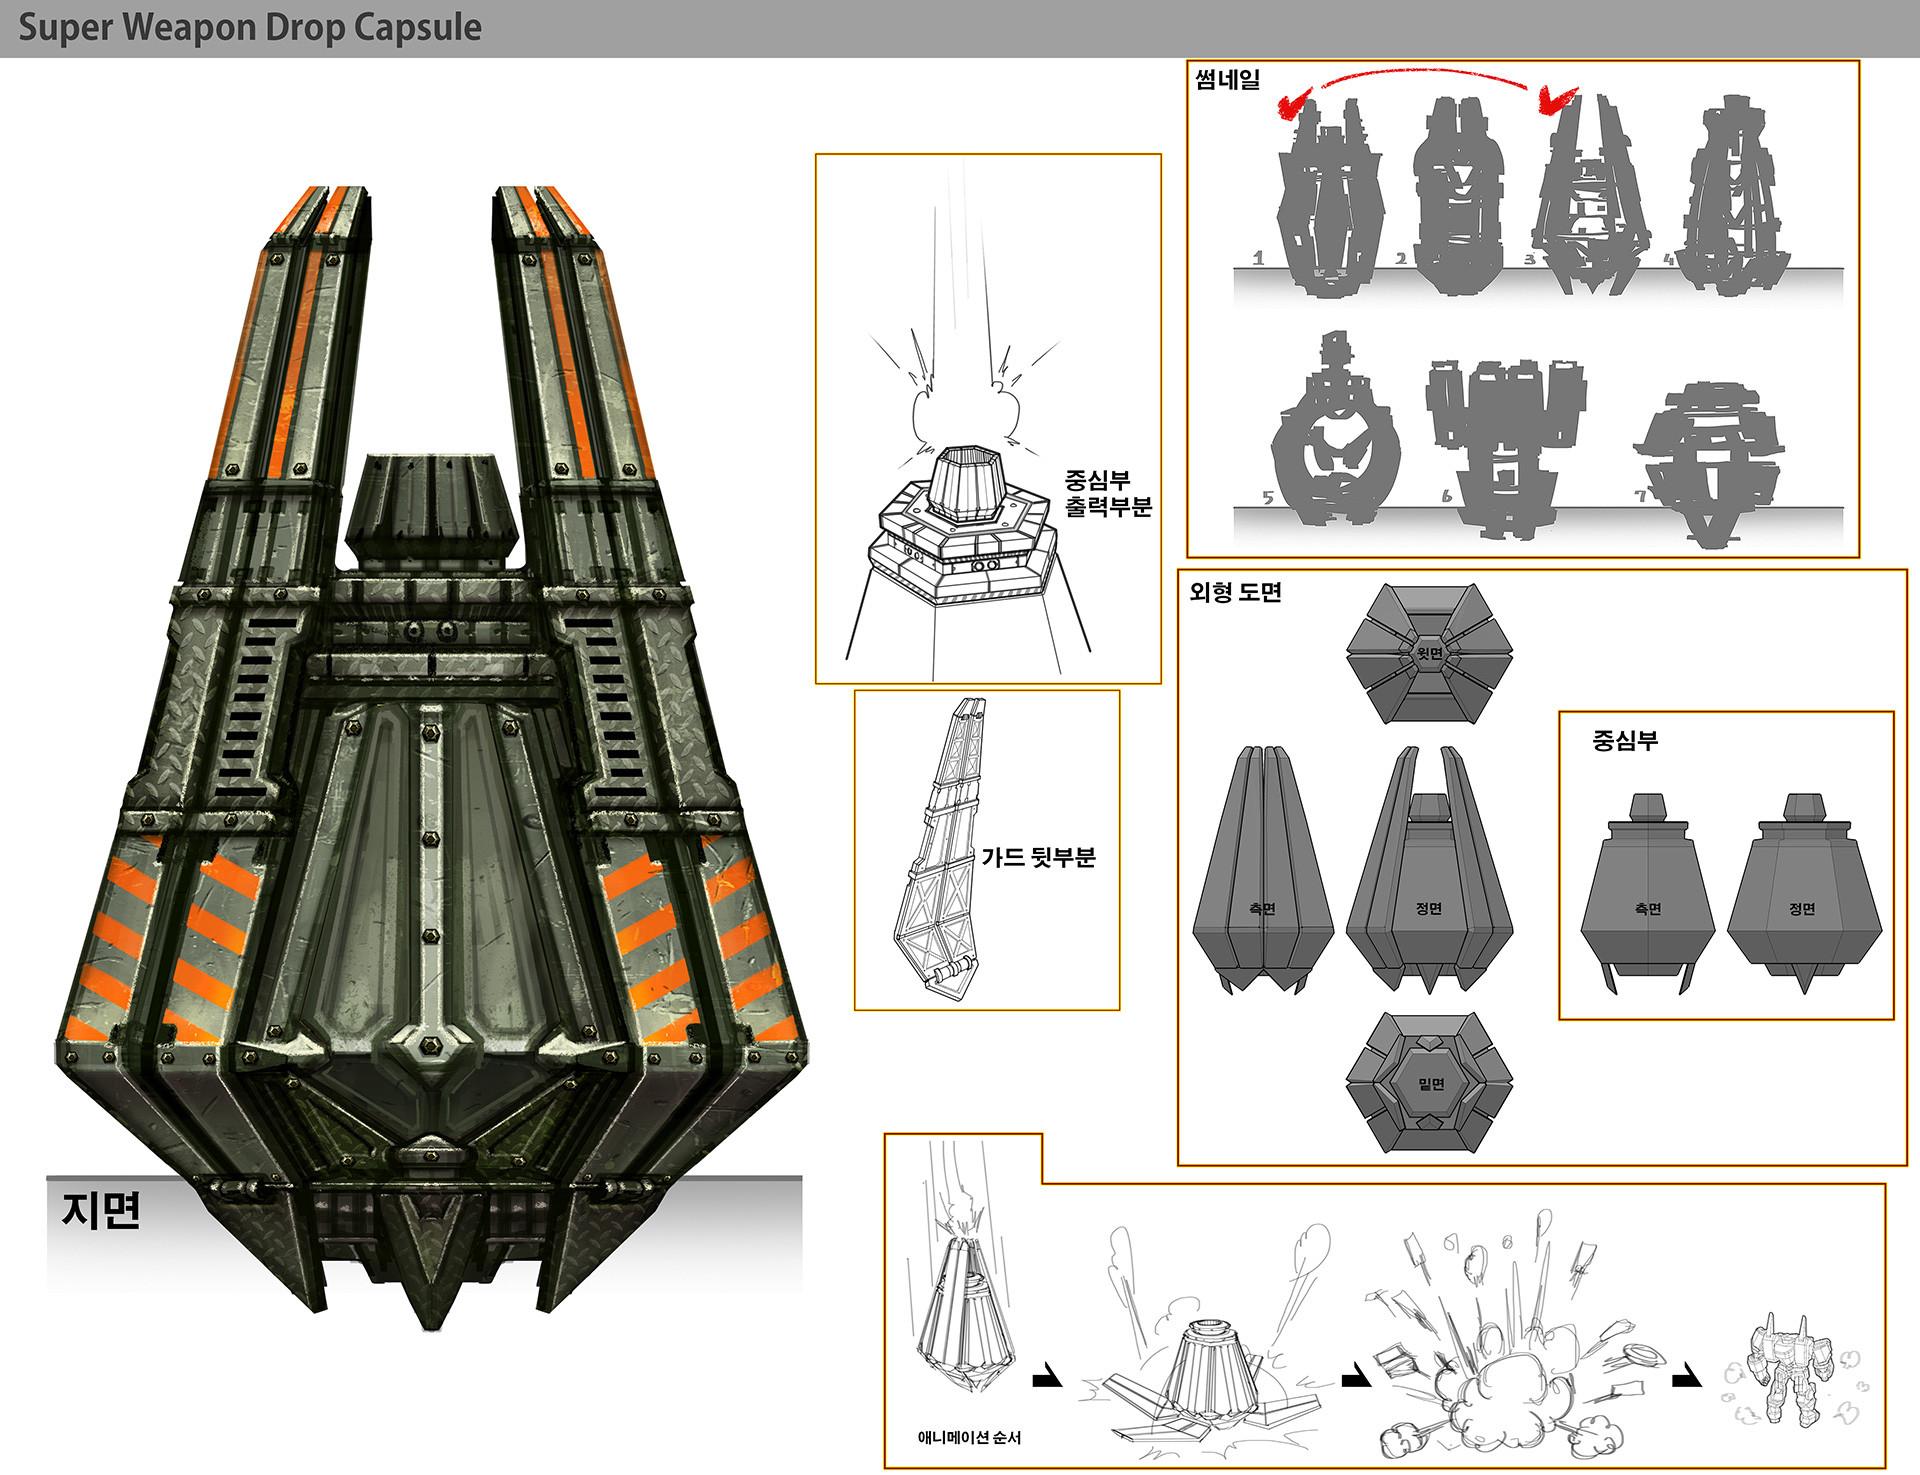 R o iaki superweapon dropcapsule 2